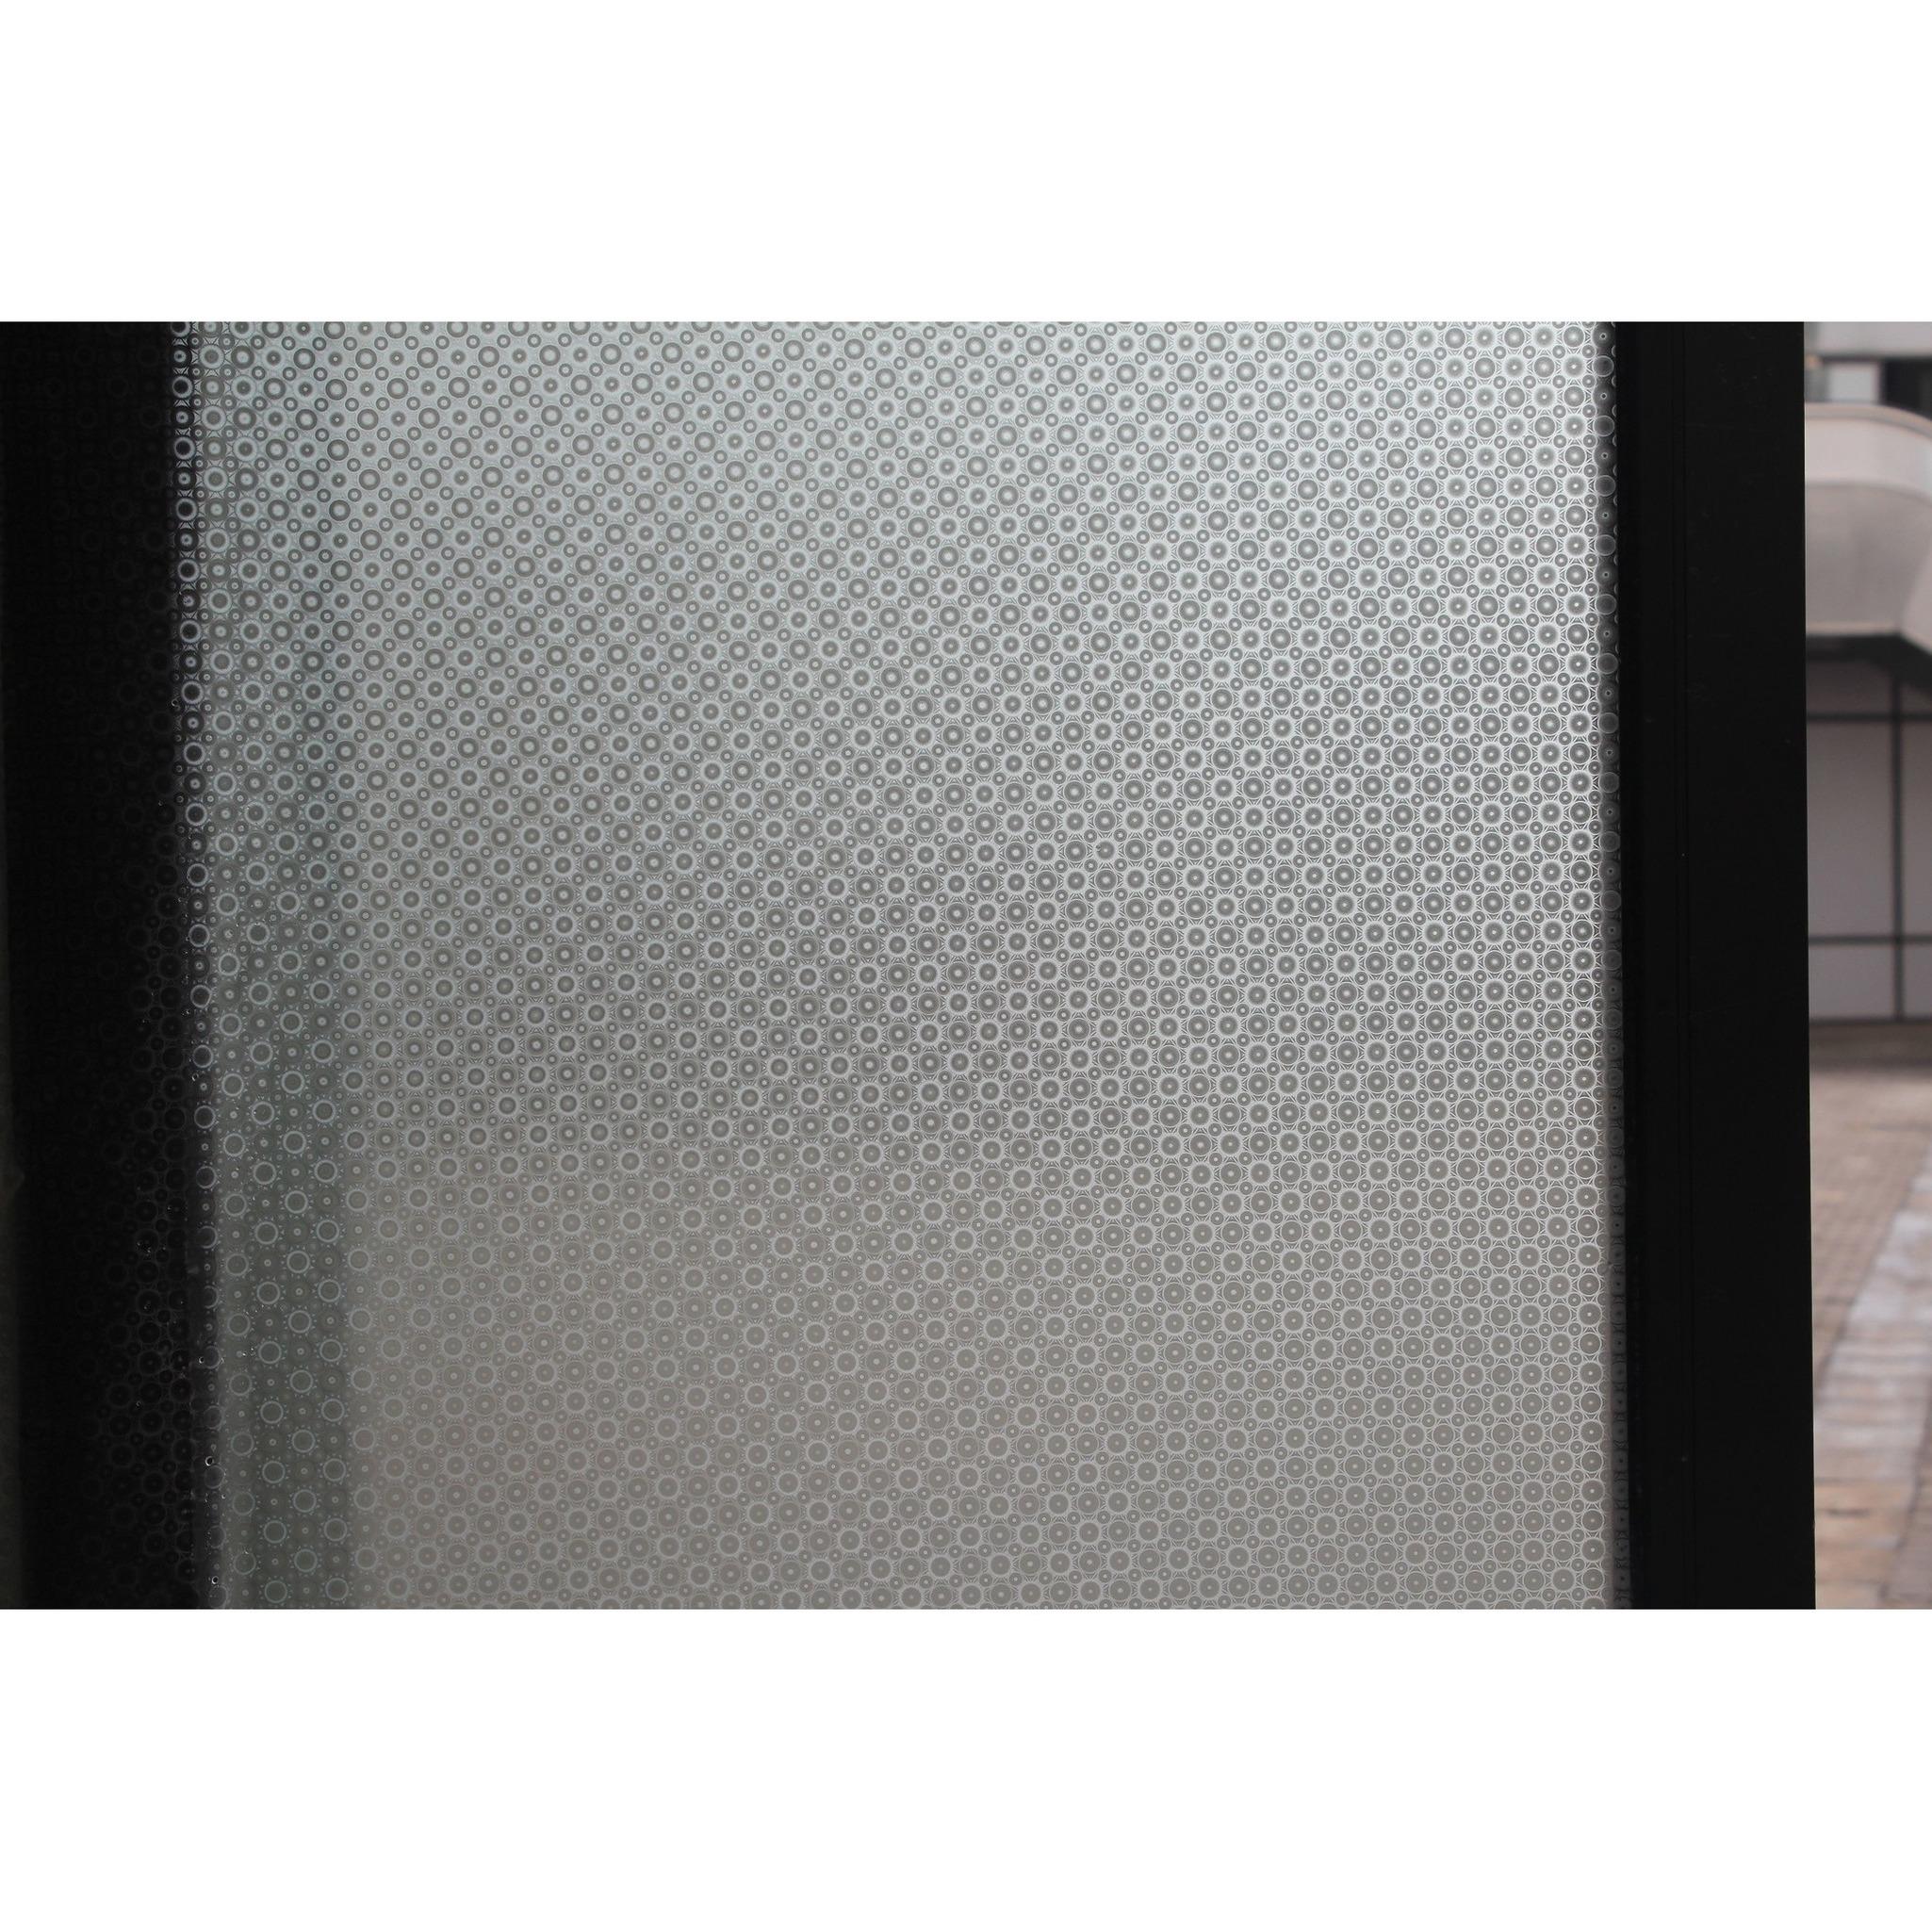 Raamfolie rondjes semi transparant 45 cm x 2 meter statisch